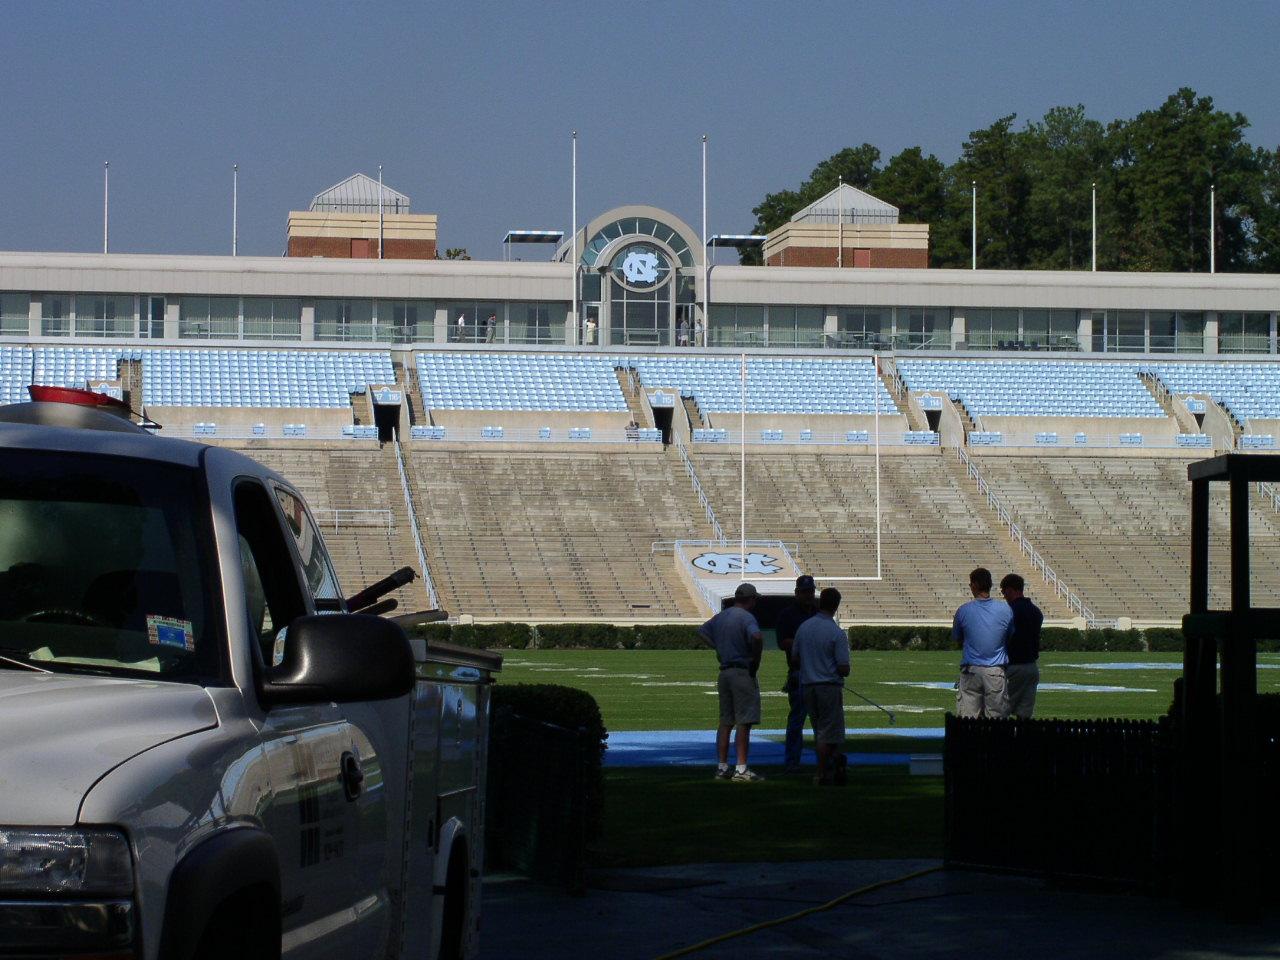 Historical Photo of Frank H. Kenan Football Center